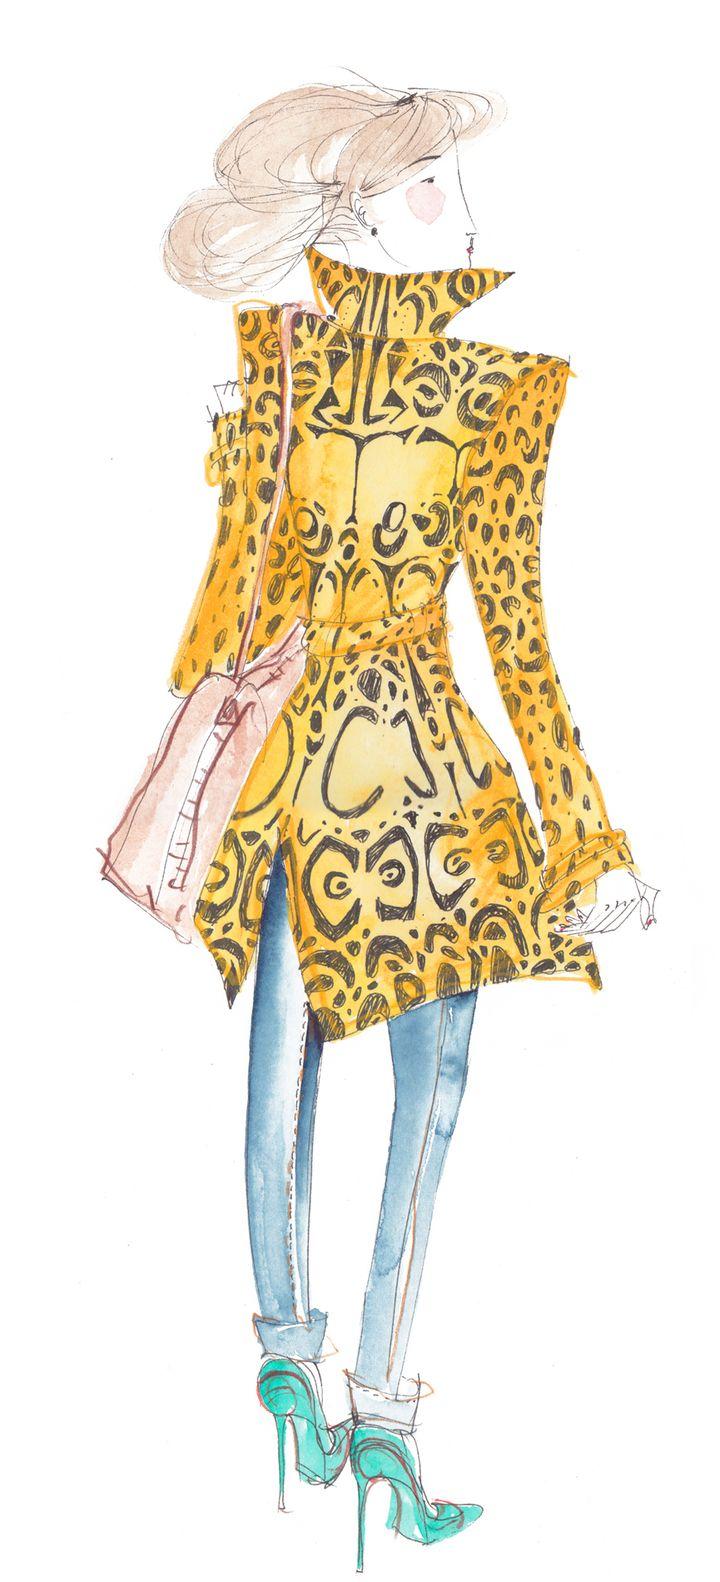 Leo Greenfield croque la fashion à Paris en 2013  (Leo Greenfield)